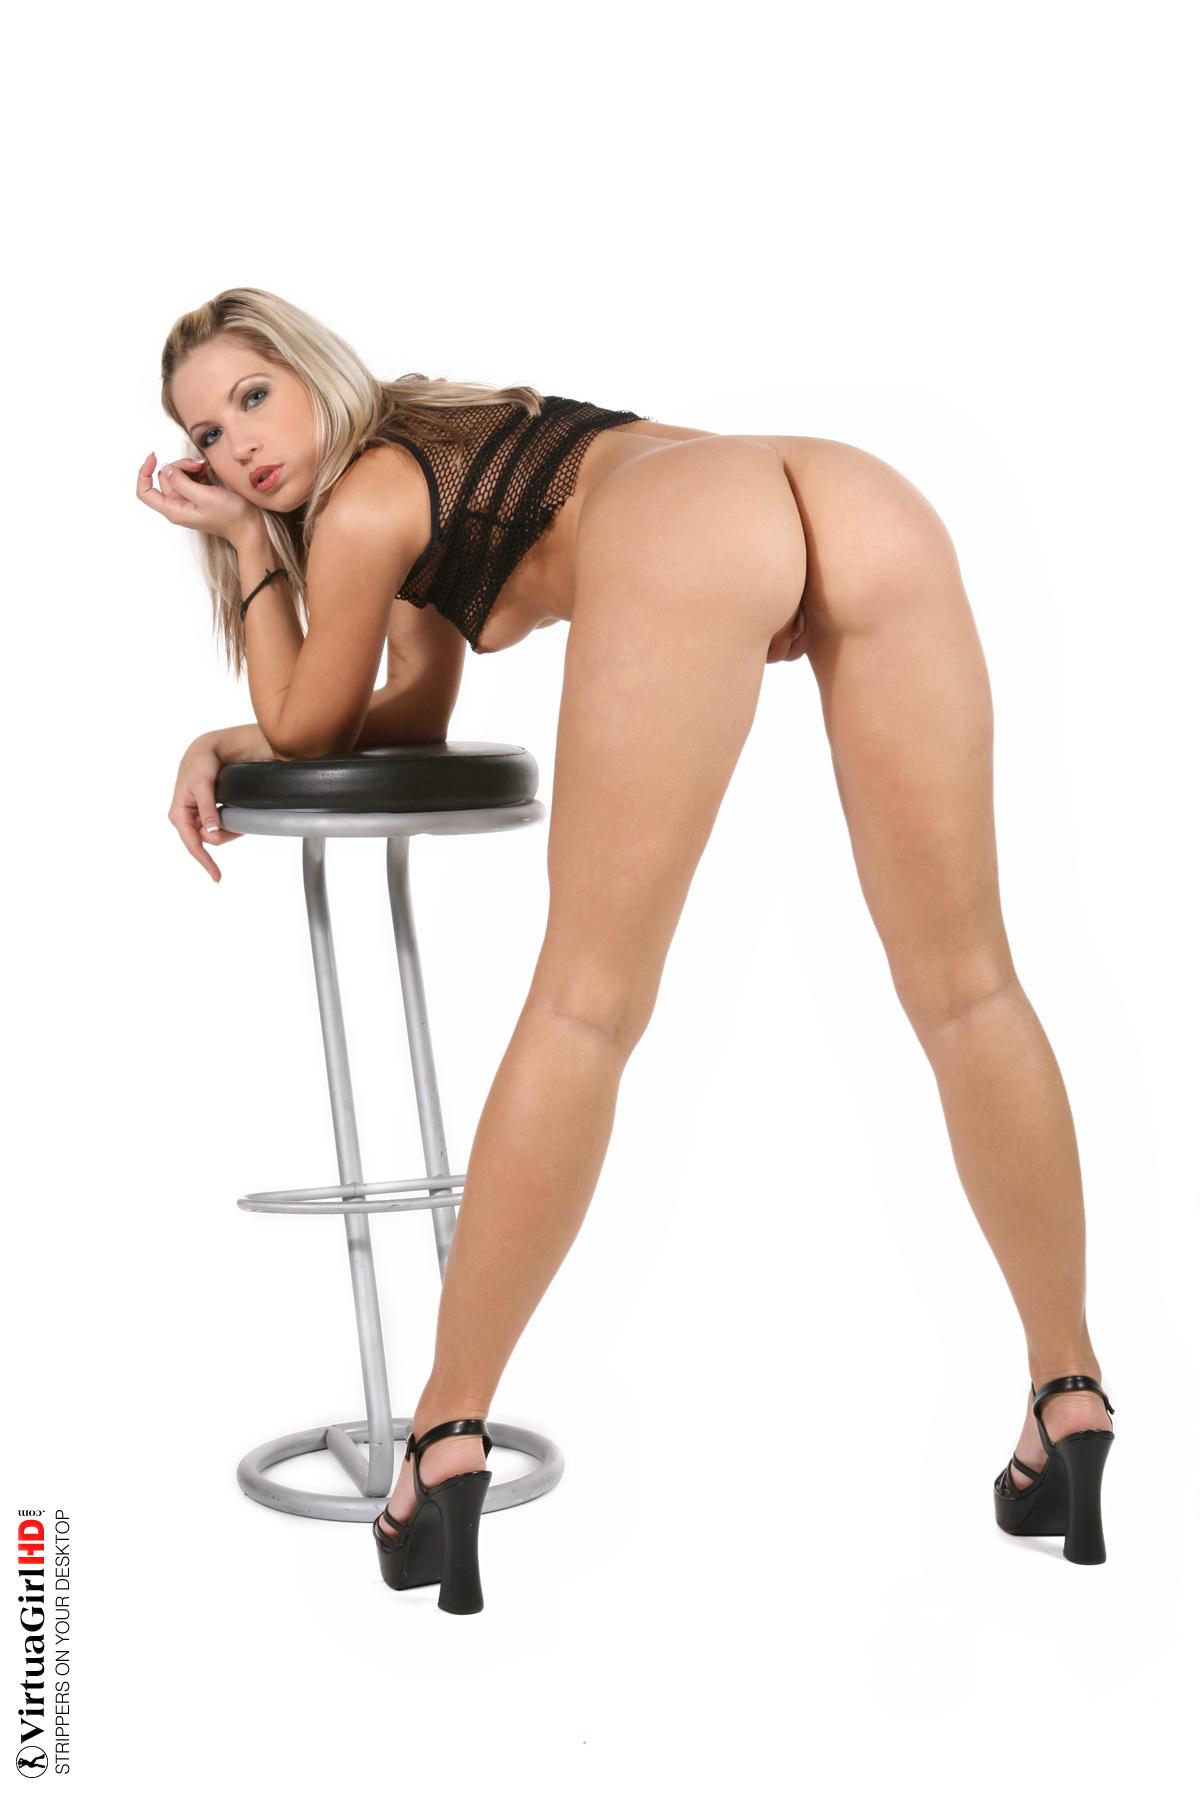 hd stripper desktop background